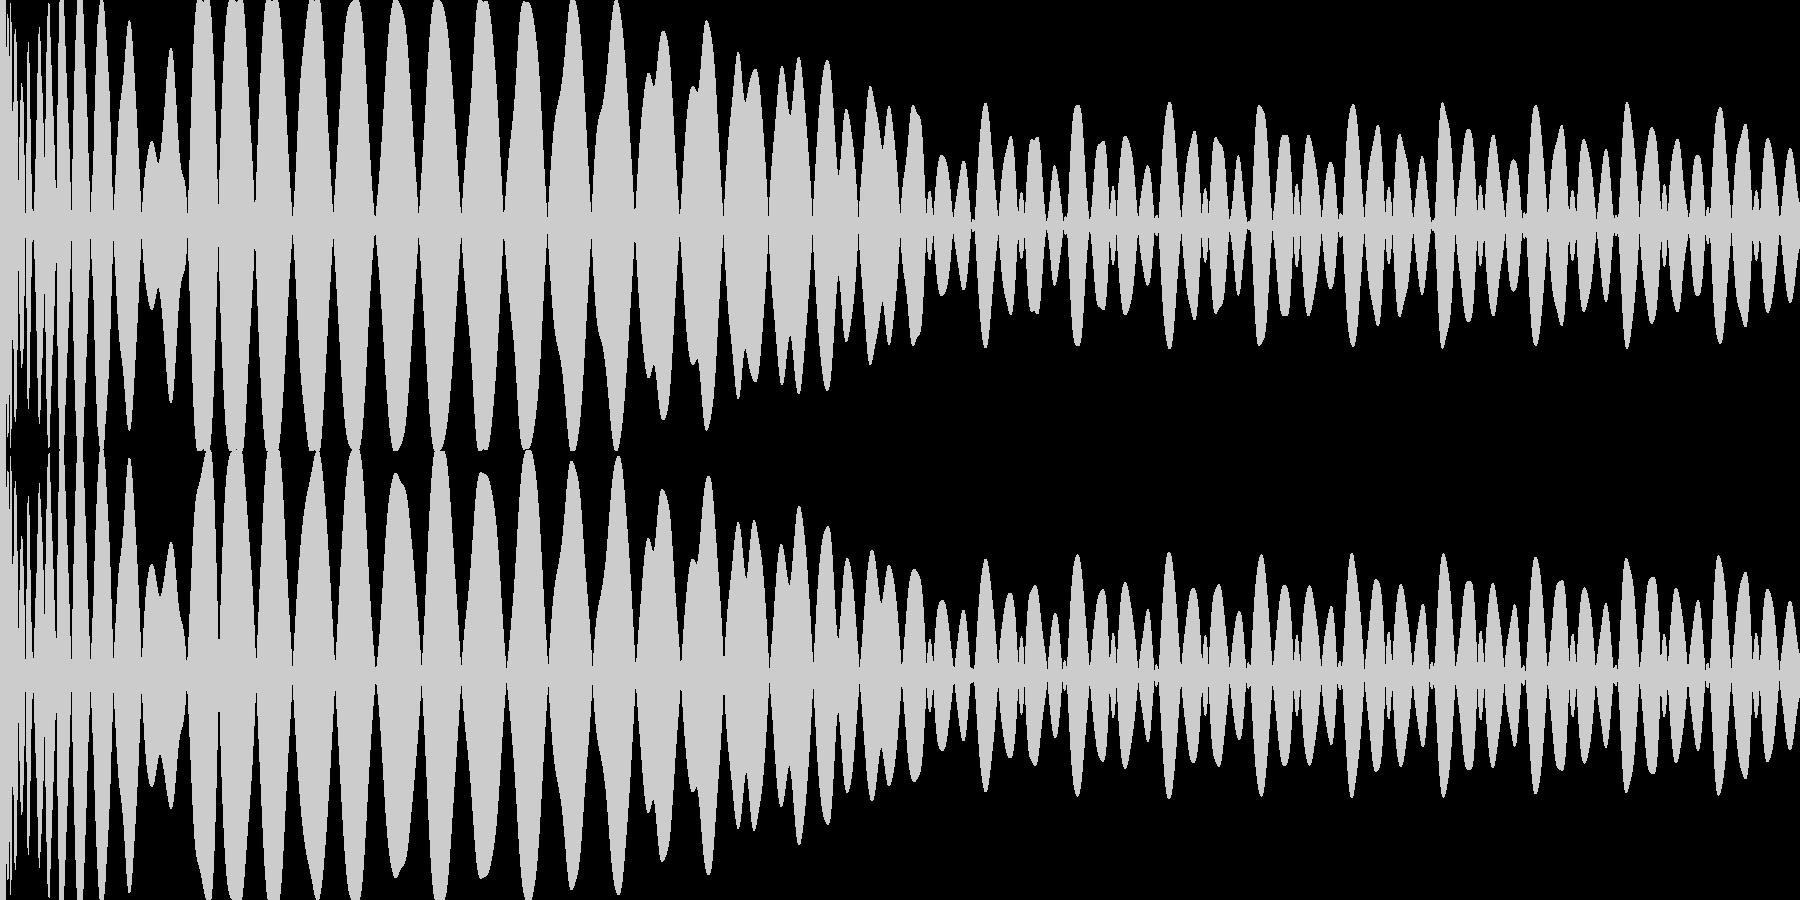 EDMキー(E)入りキック の未再生の波形